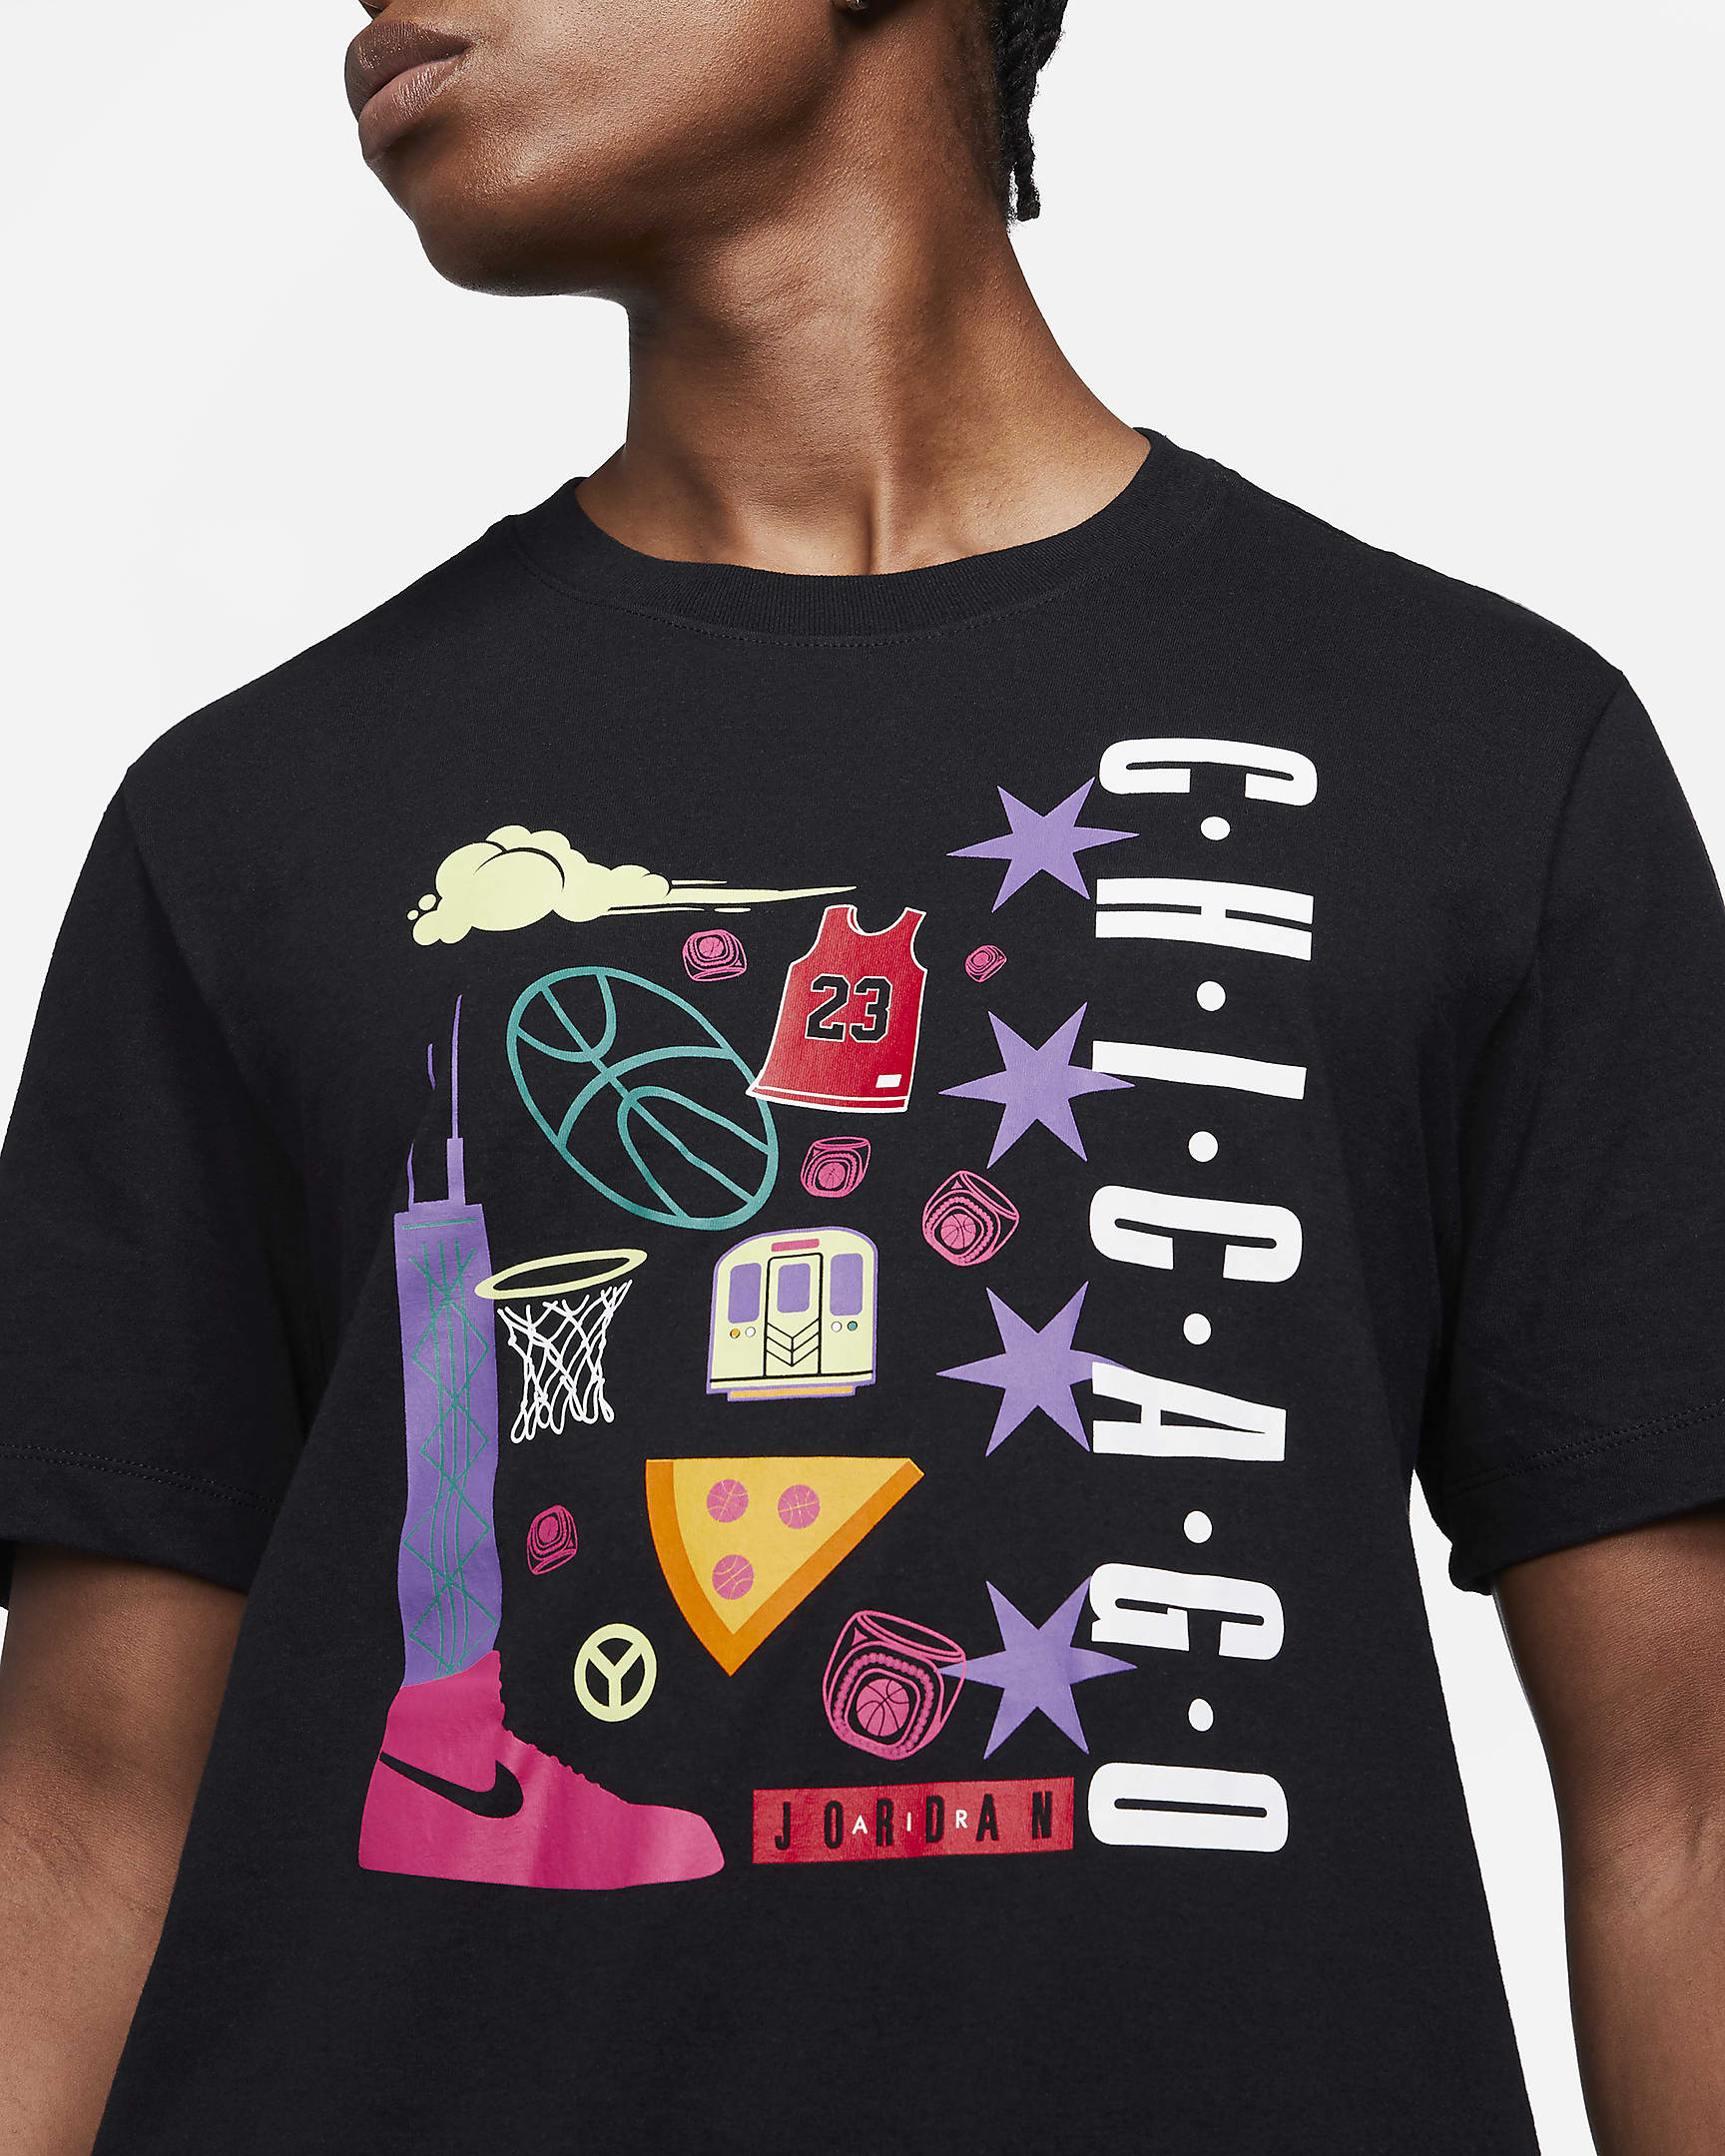 jordan-chicago-mens-short-sleeve-t-shirt-H6Z2DR